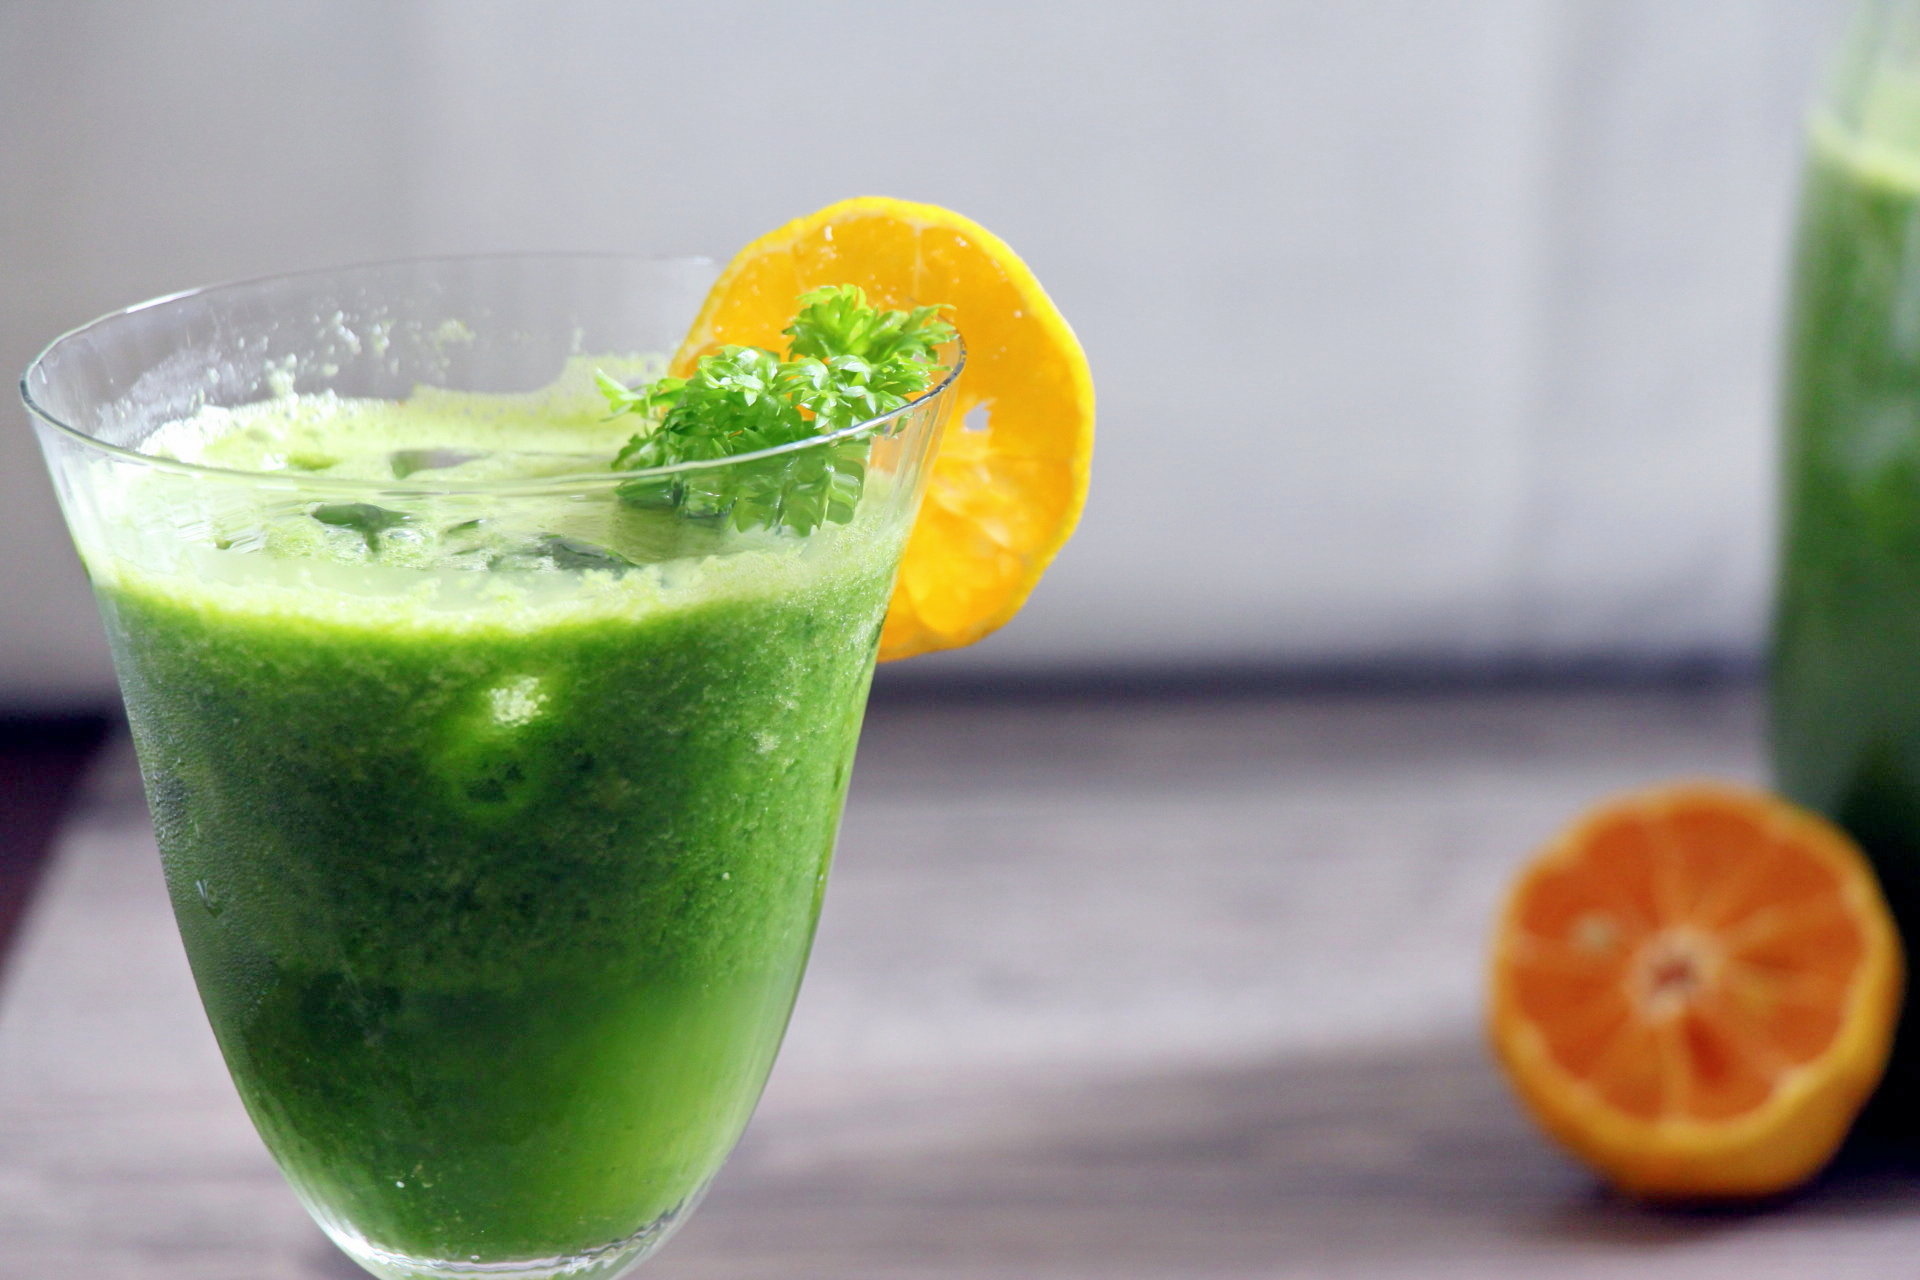 greenjuice final-close